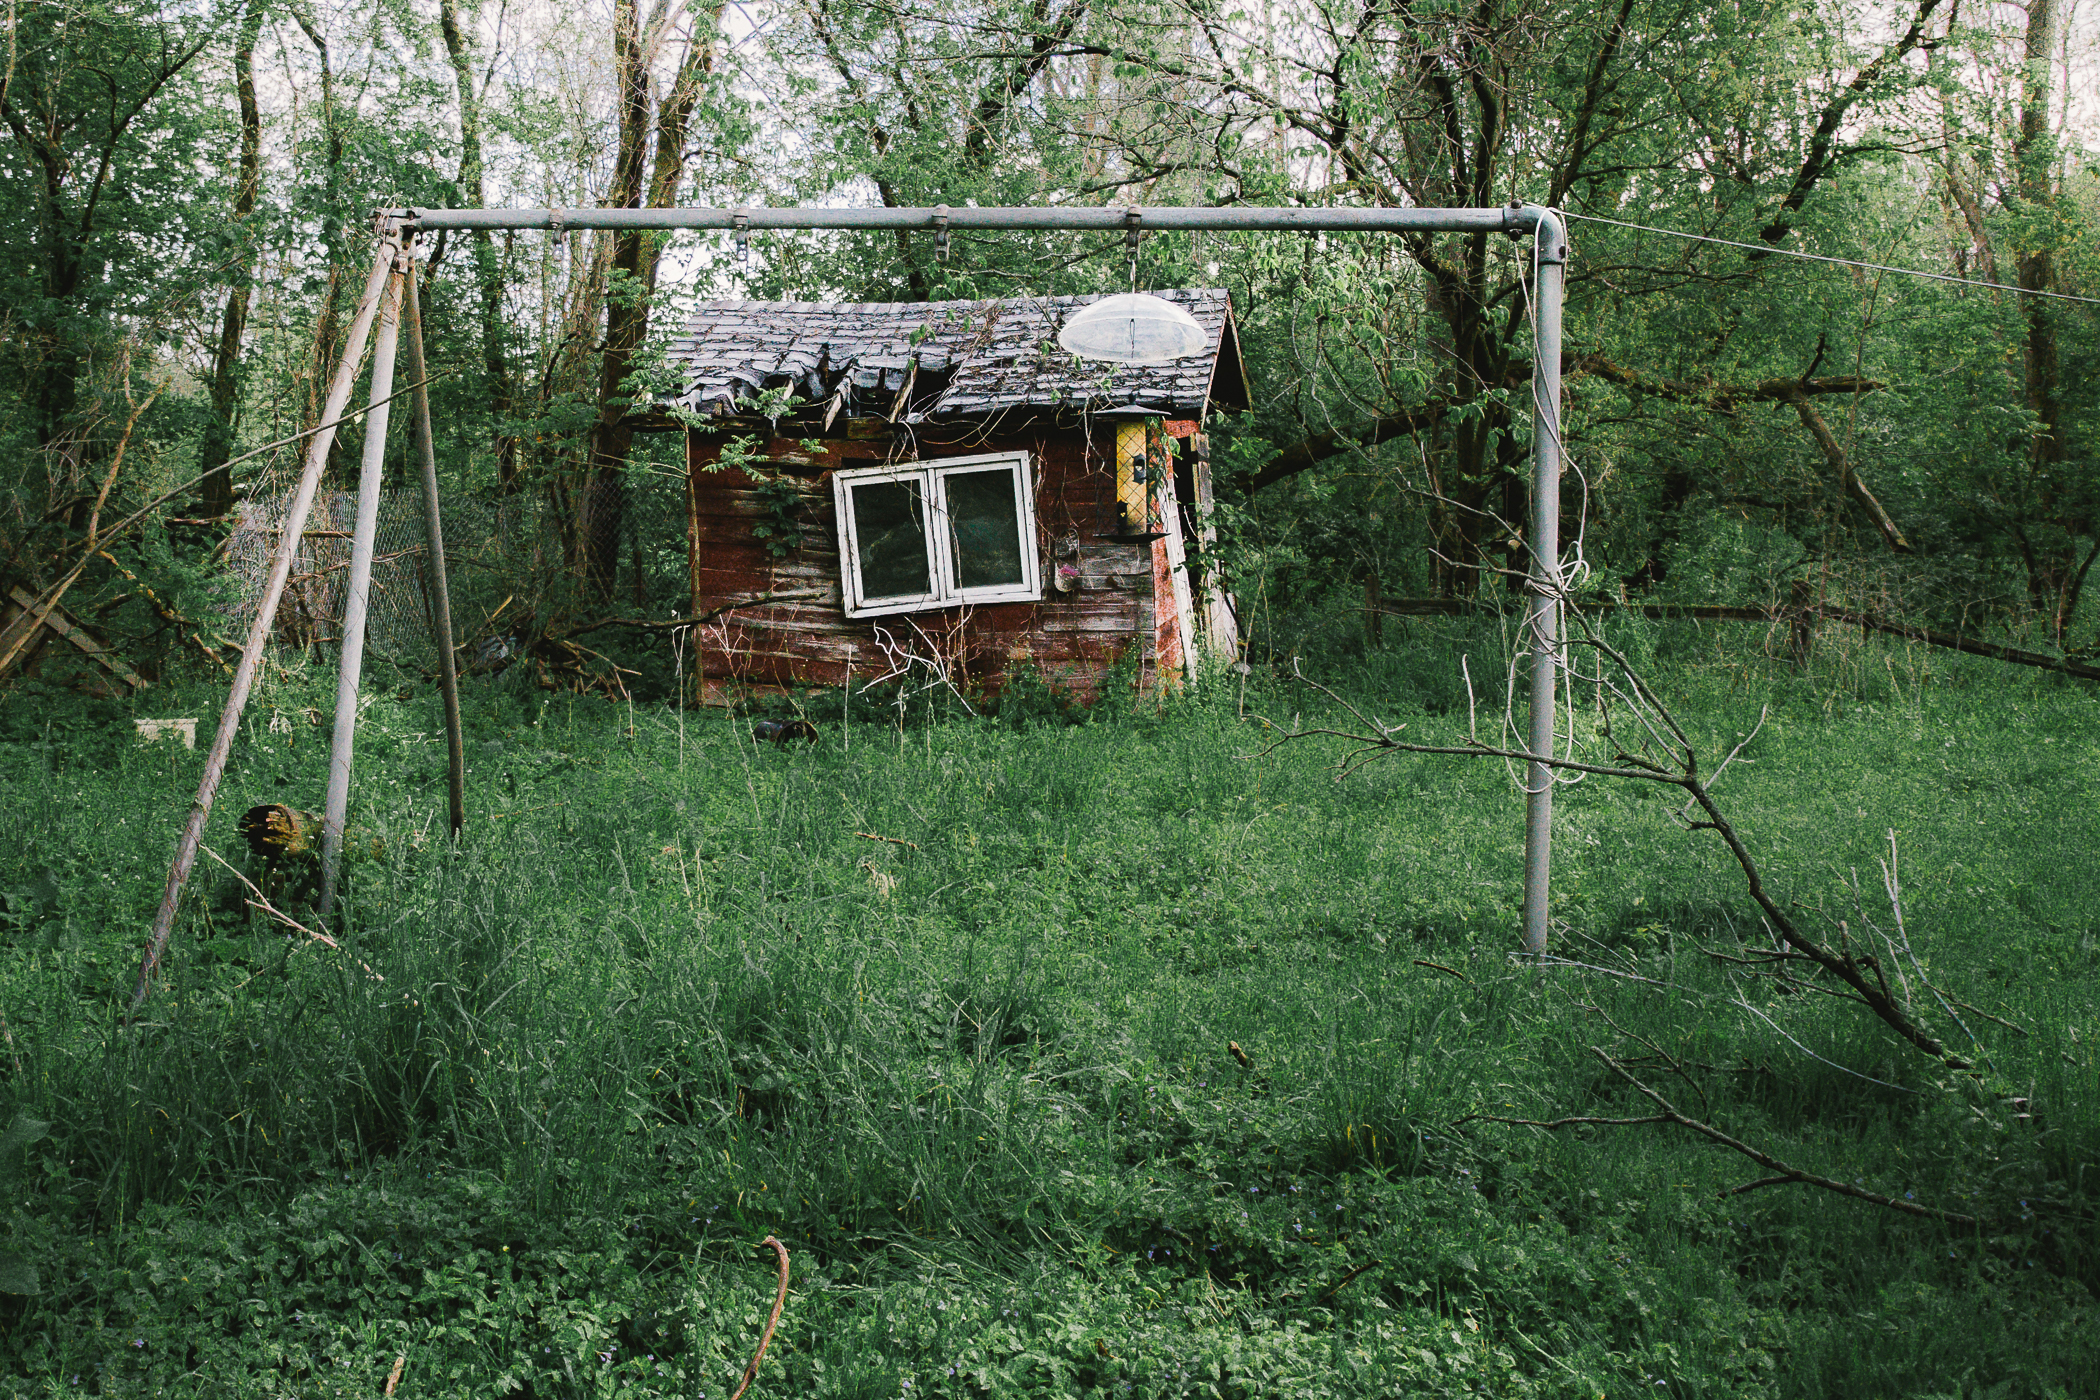 Rusty swingsets, bird feeders, sheds...